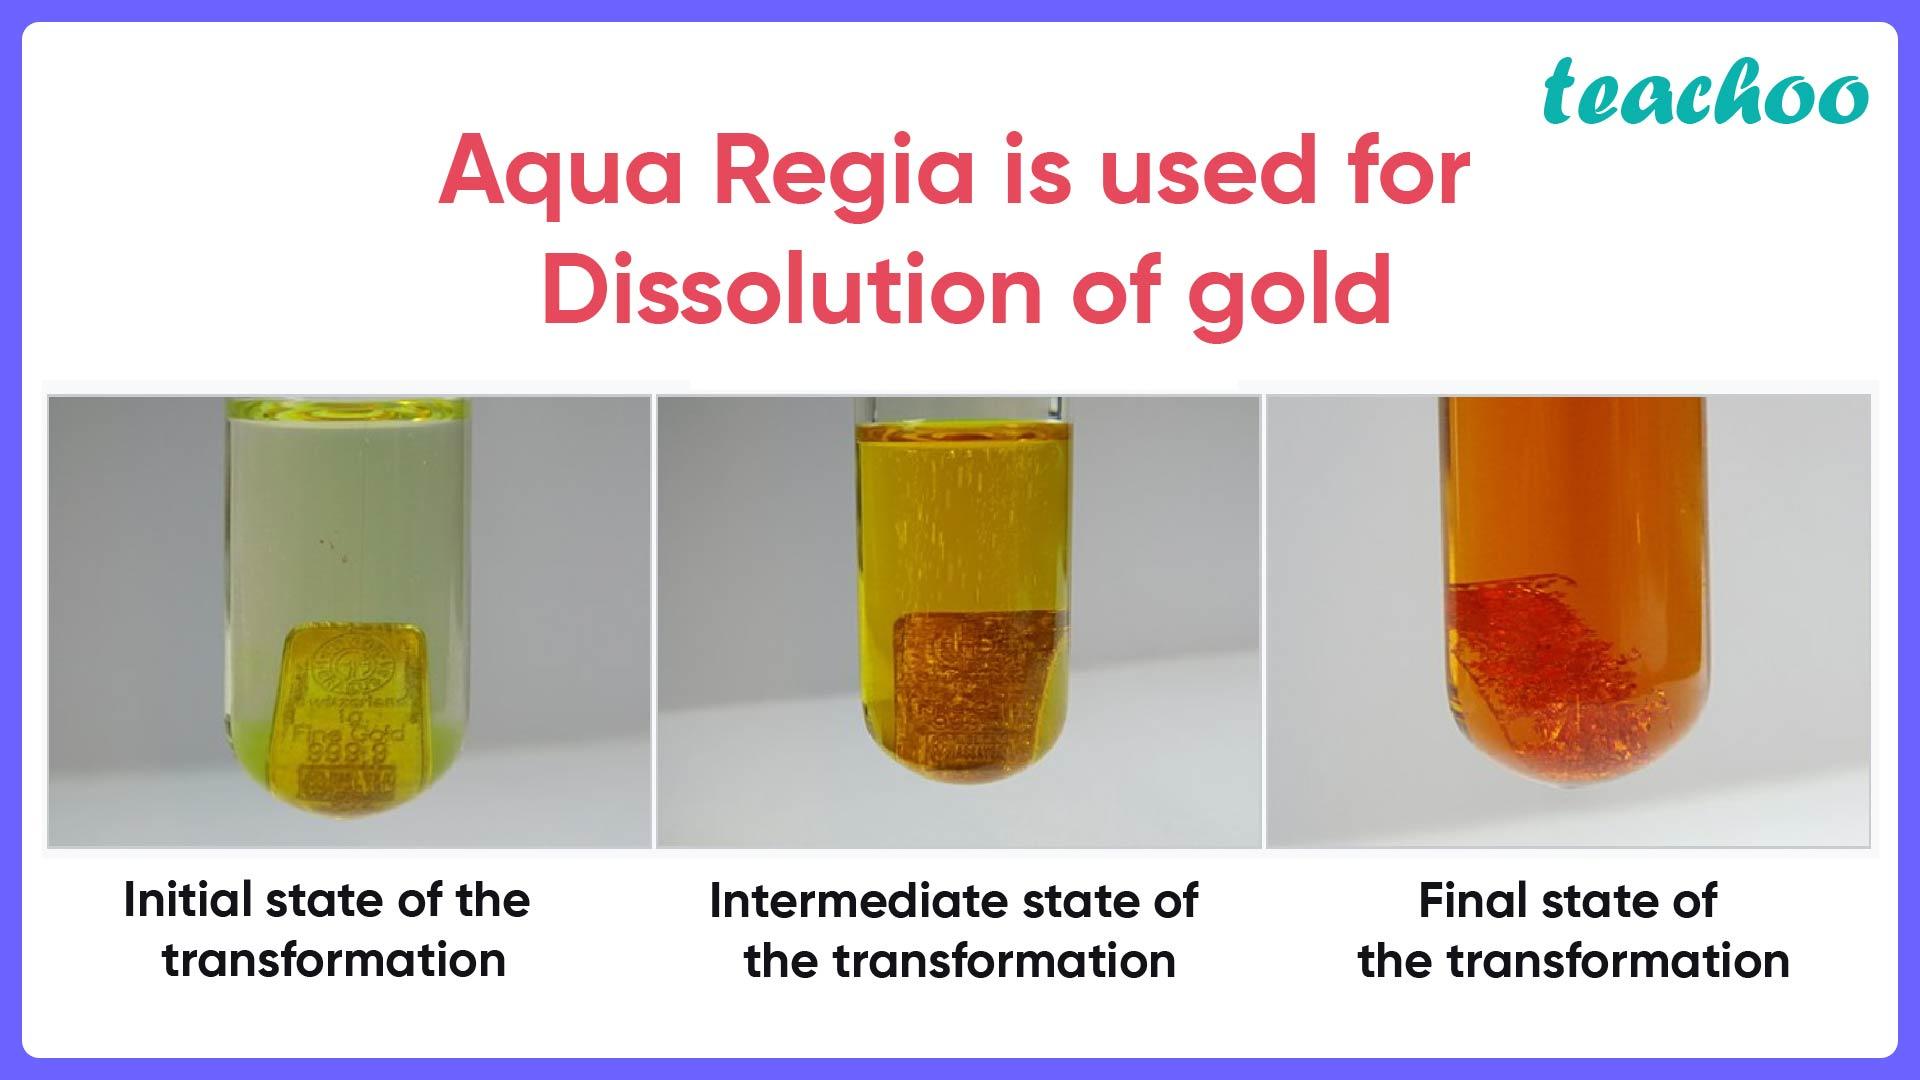 Aqua Regia is used for Dissolution of gold - Teachoo.jpg